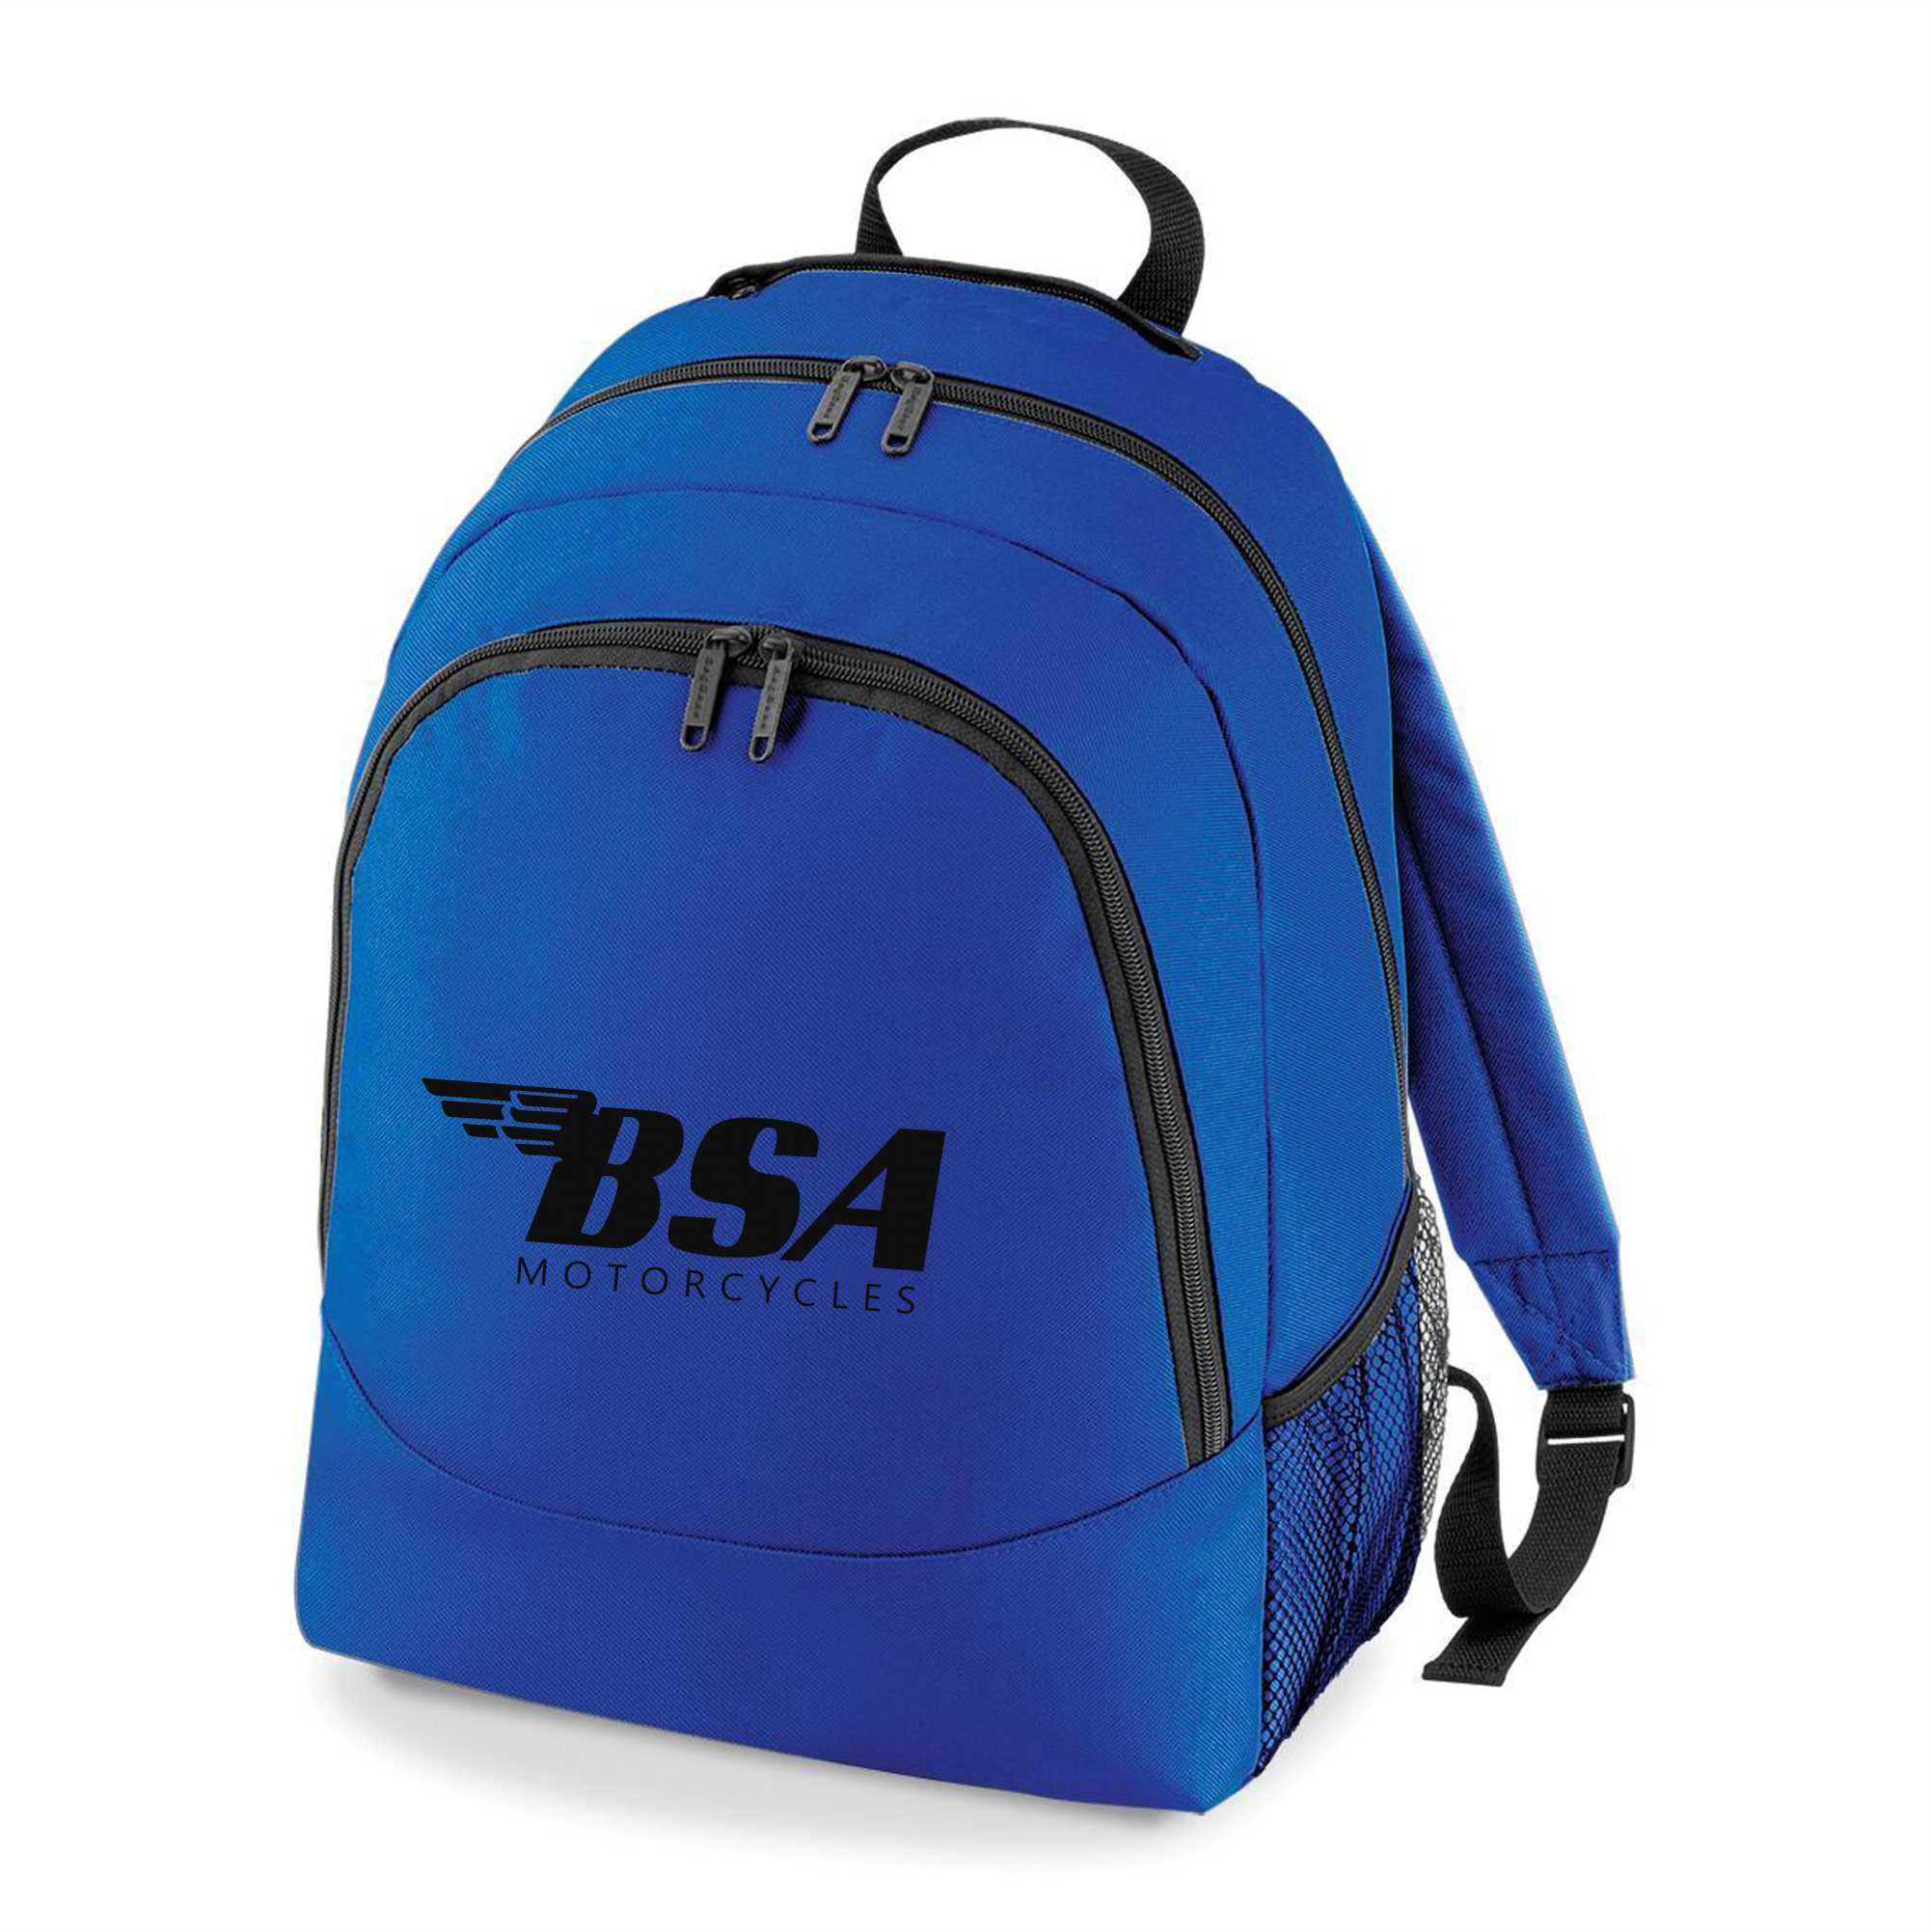 BSA Motorcycles Rucksack Bag